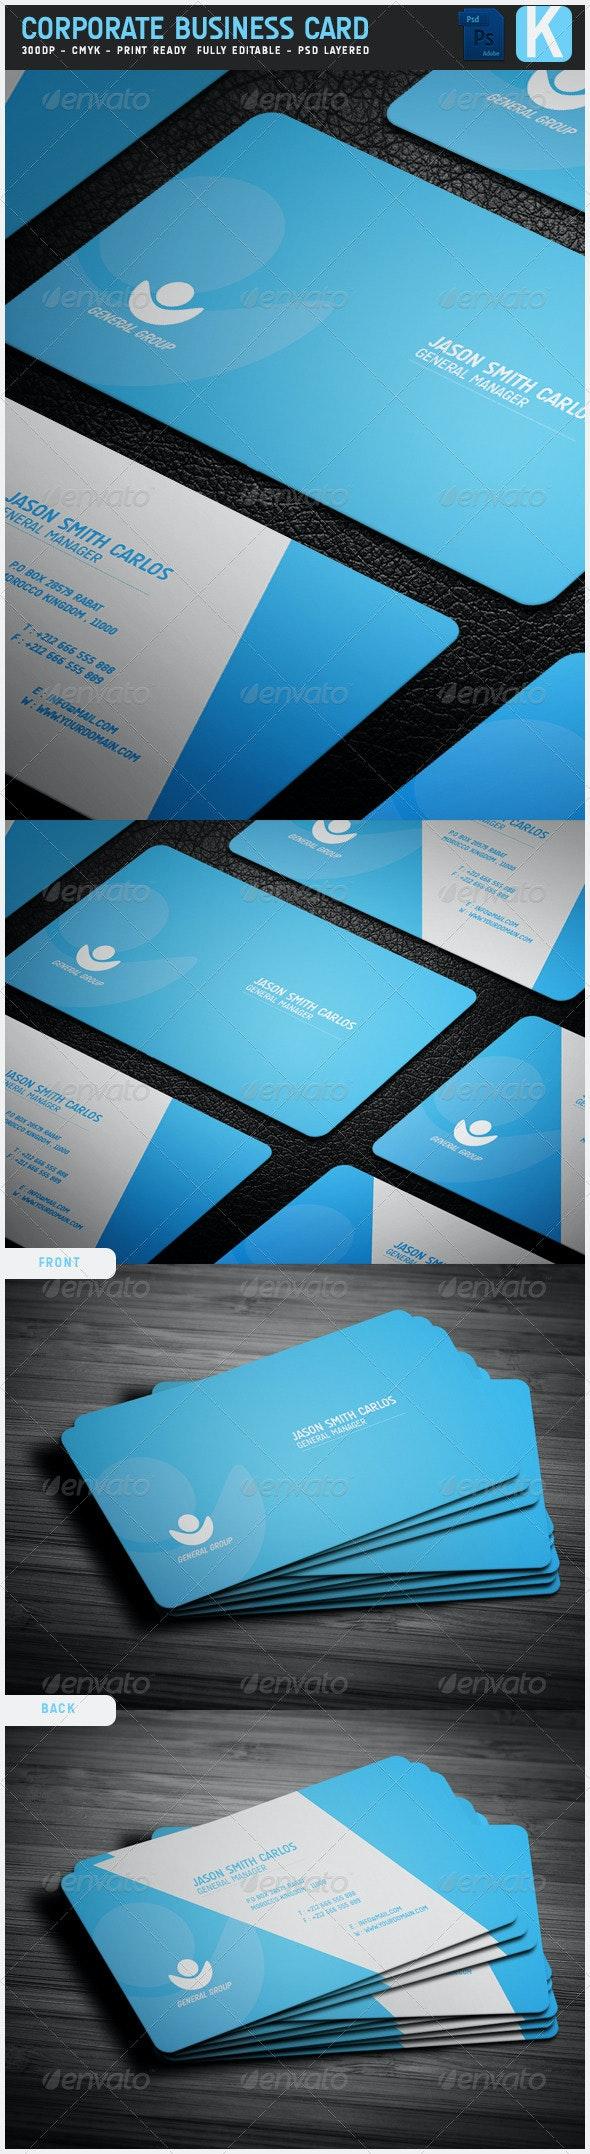 Corporate Business Card 3 - Corporate Business Cards